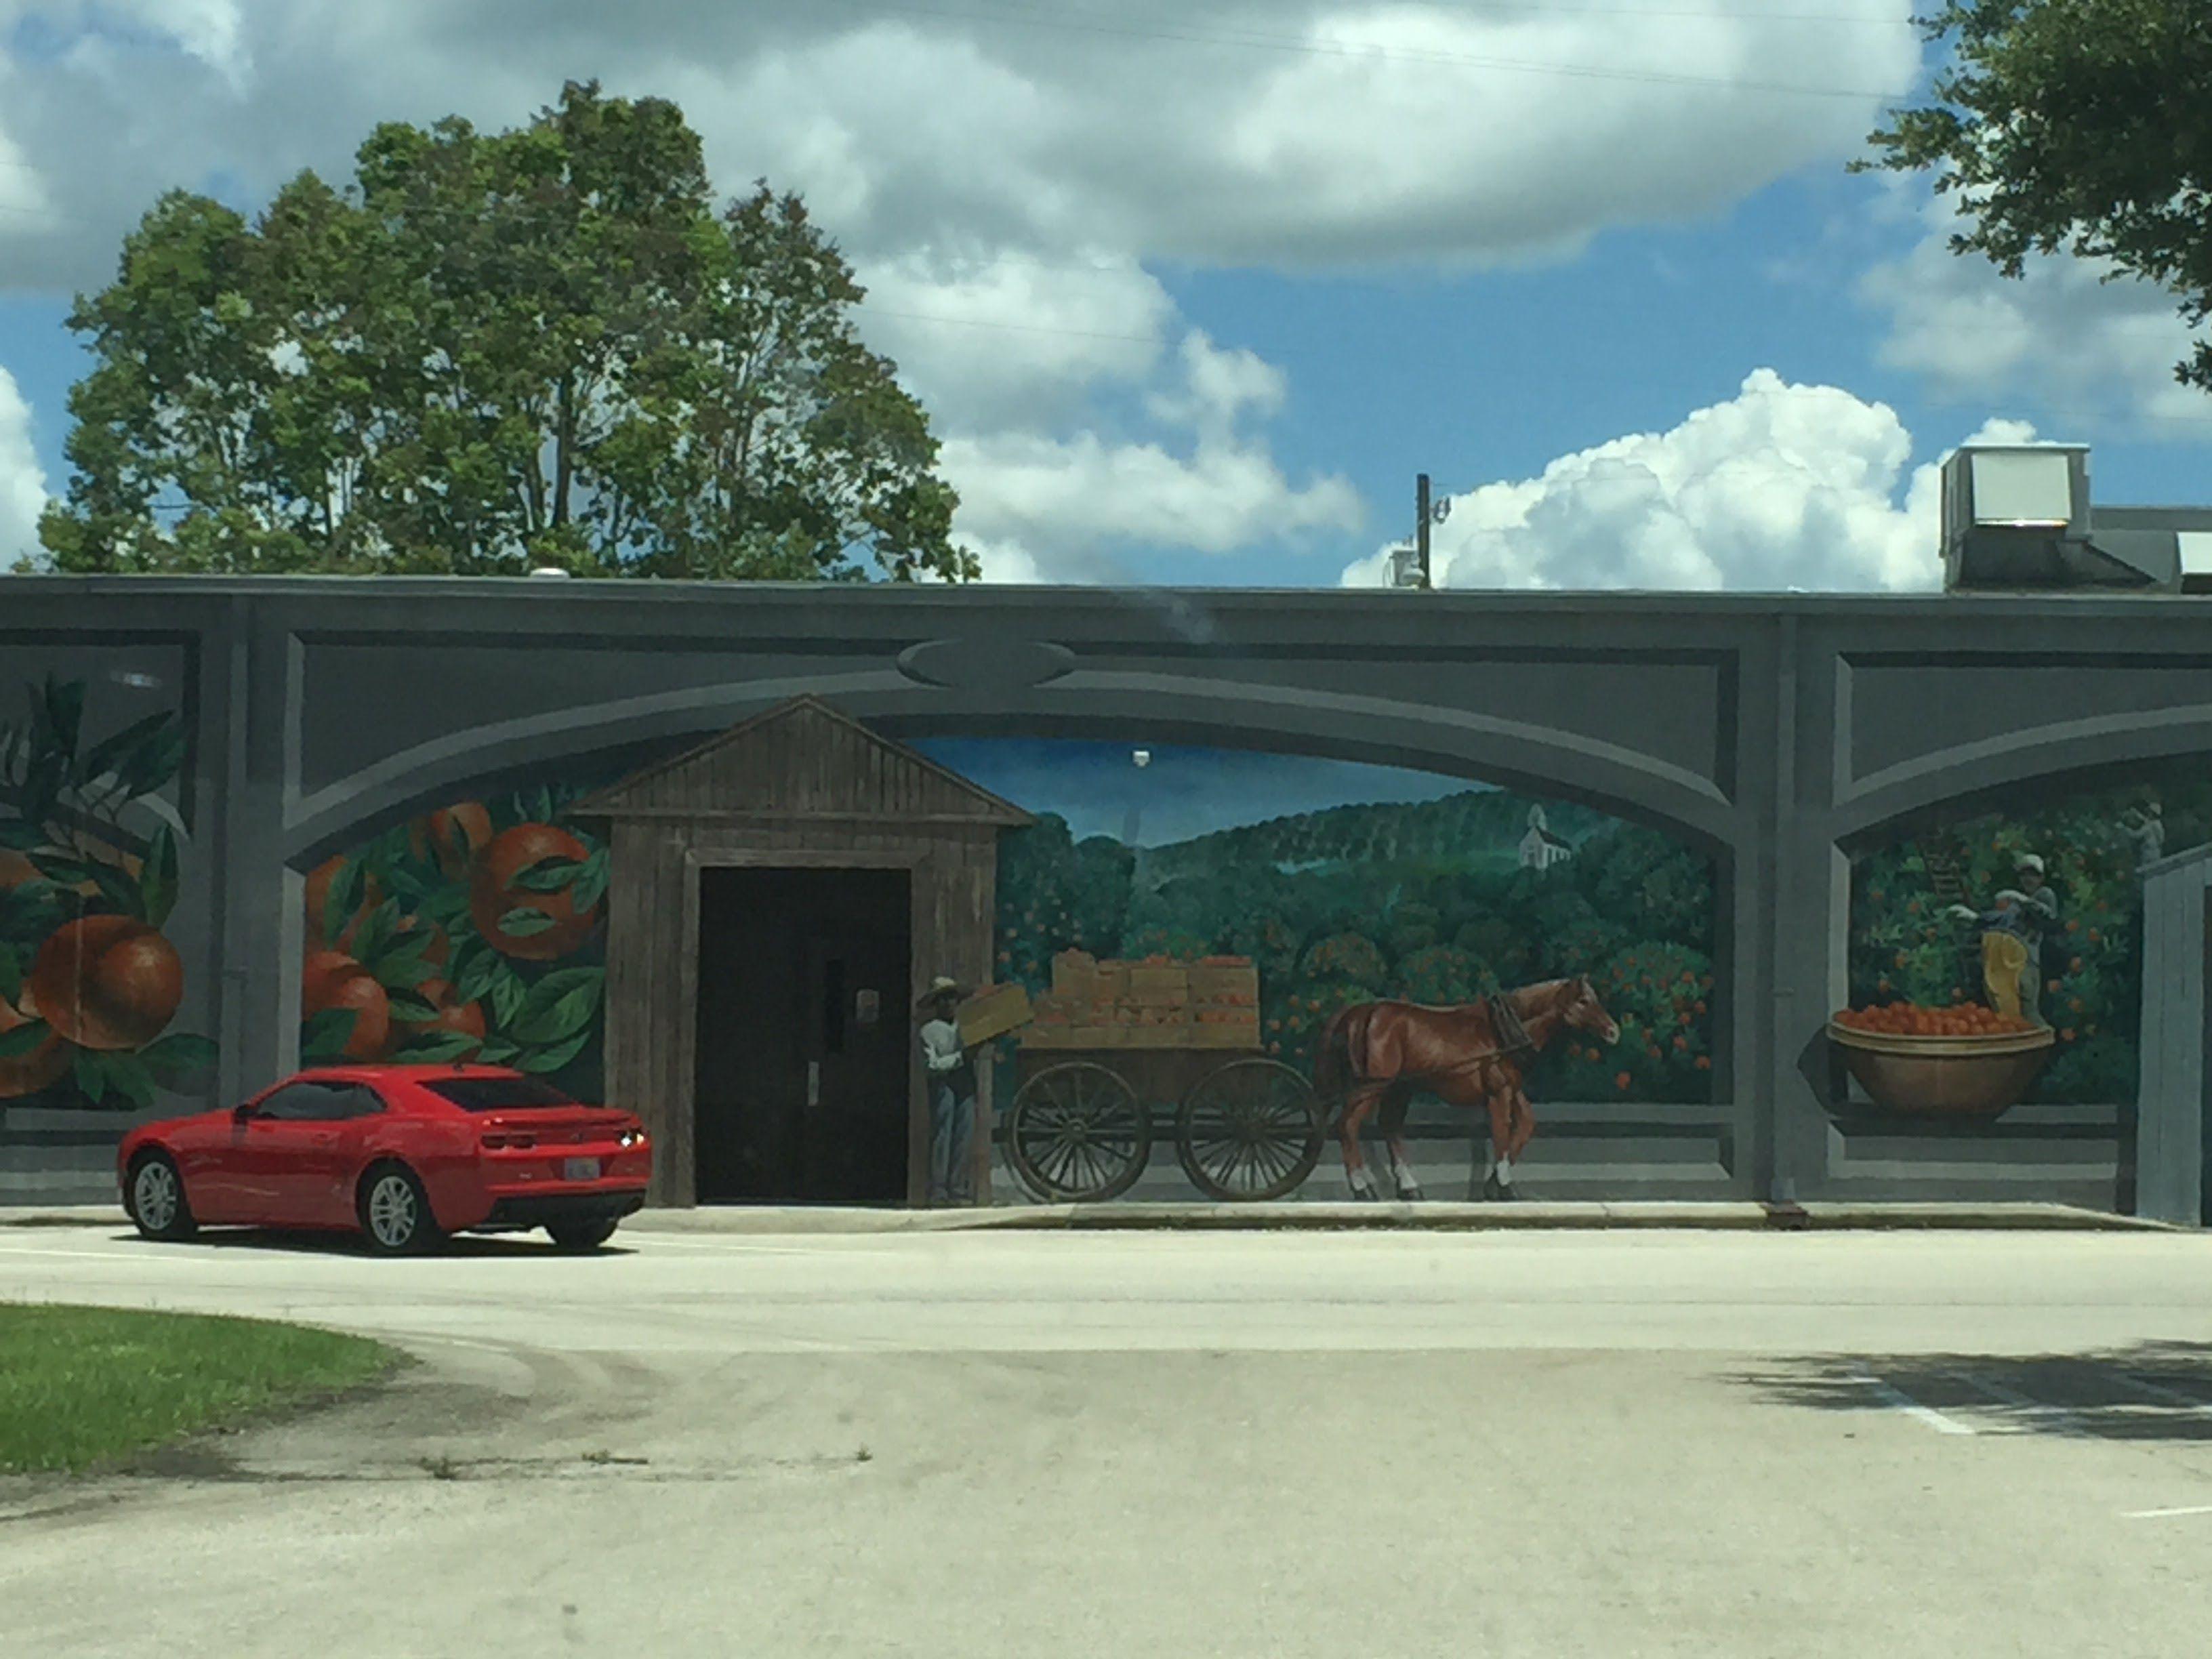 Sebring Fl The City Of Murals Sebring Florida Outdoor Structures Mural